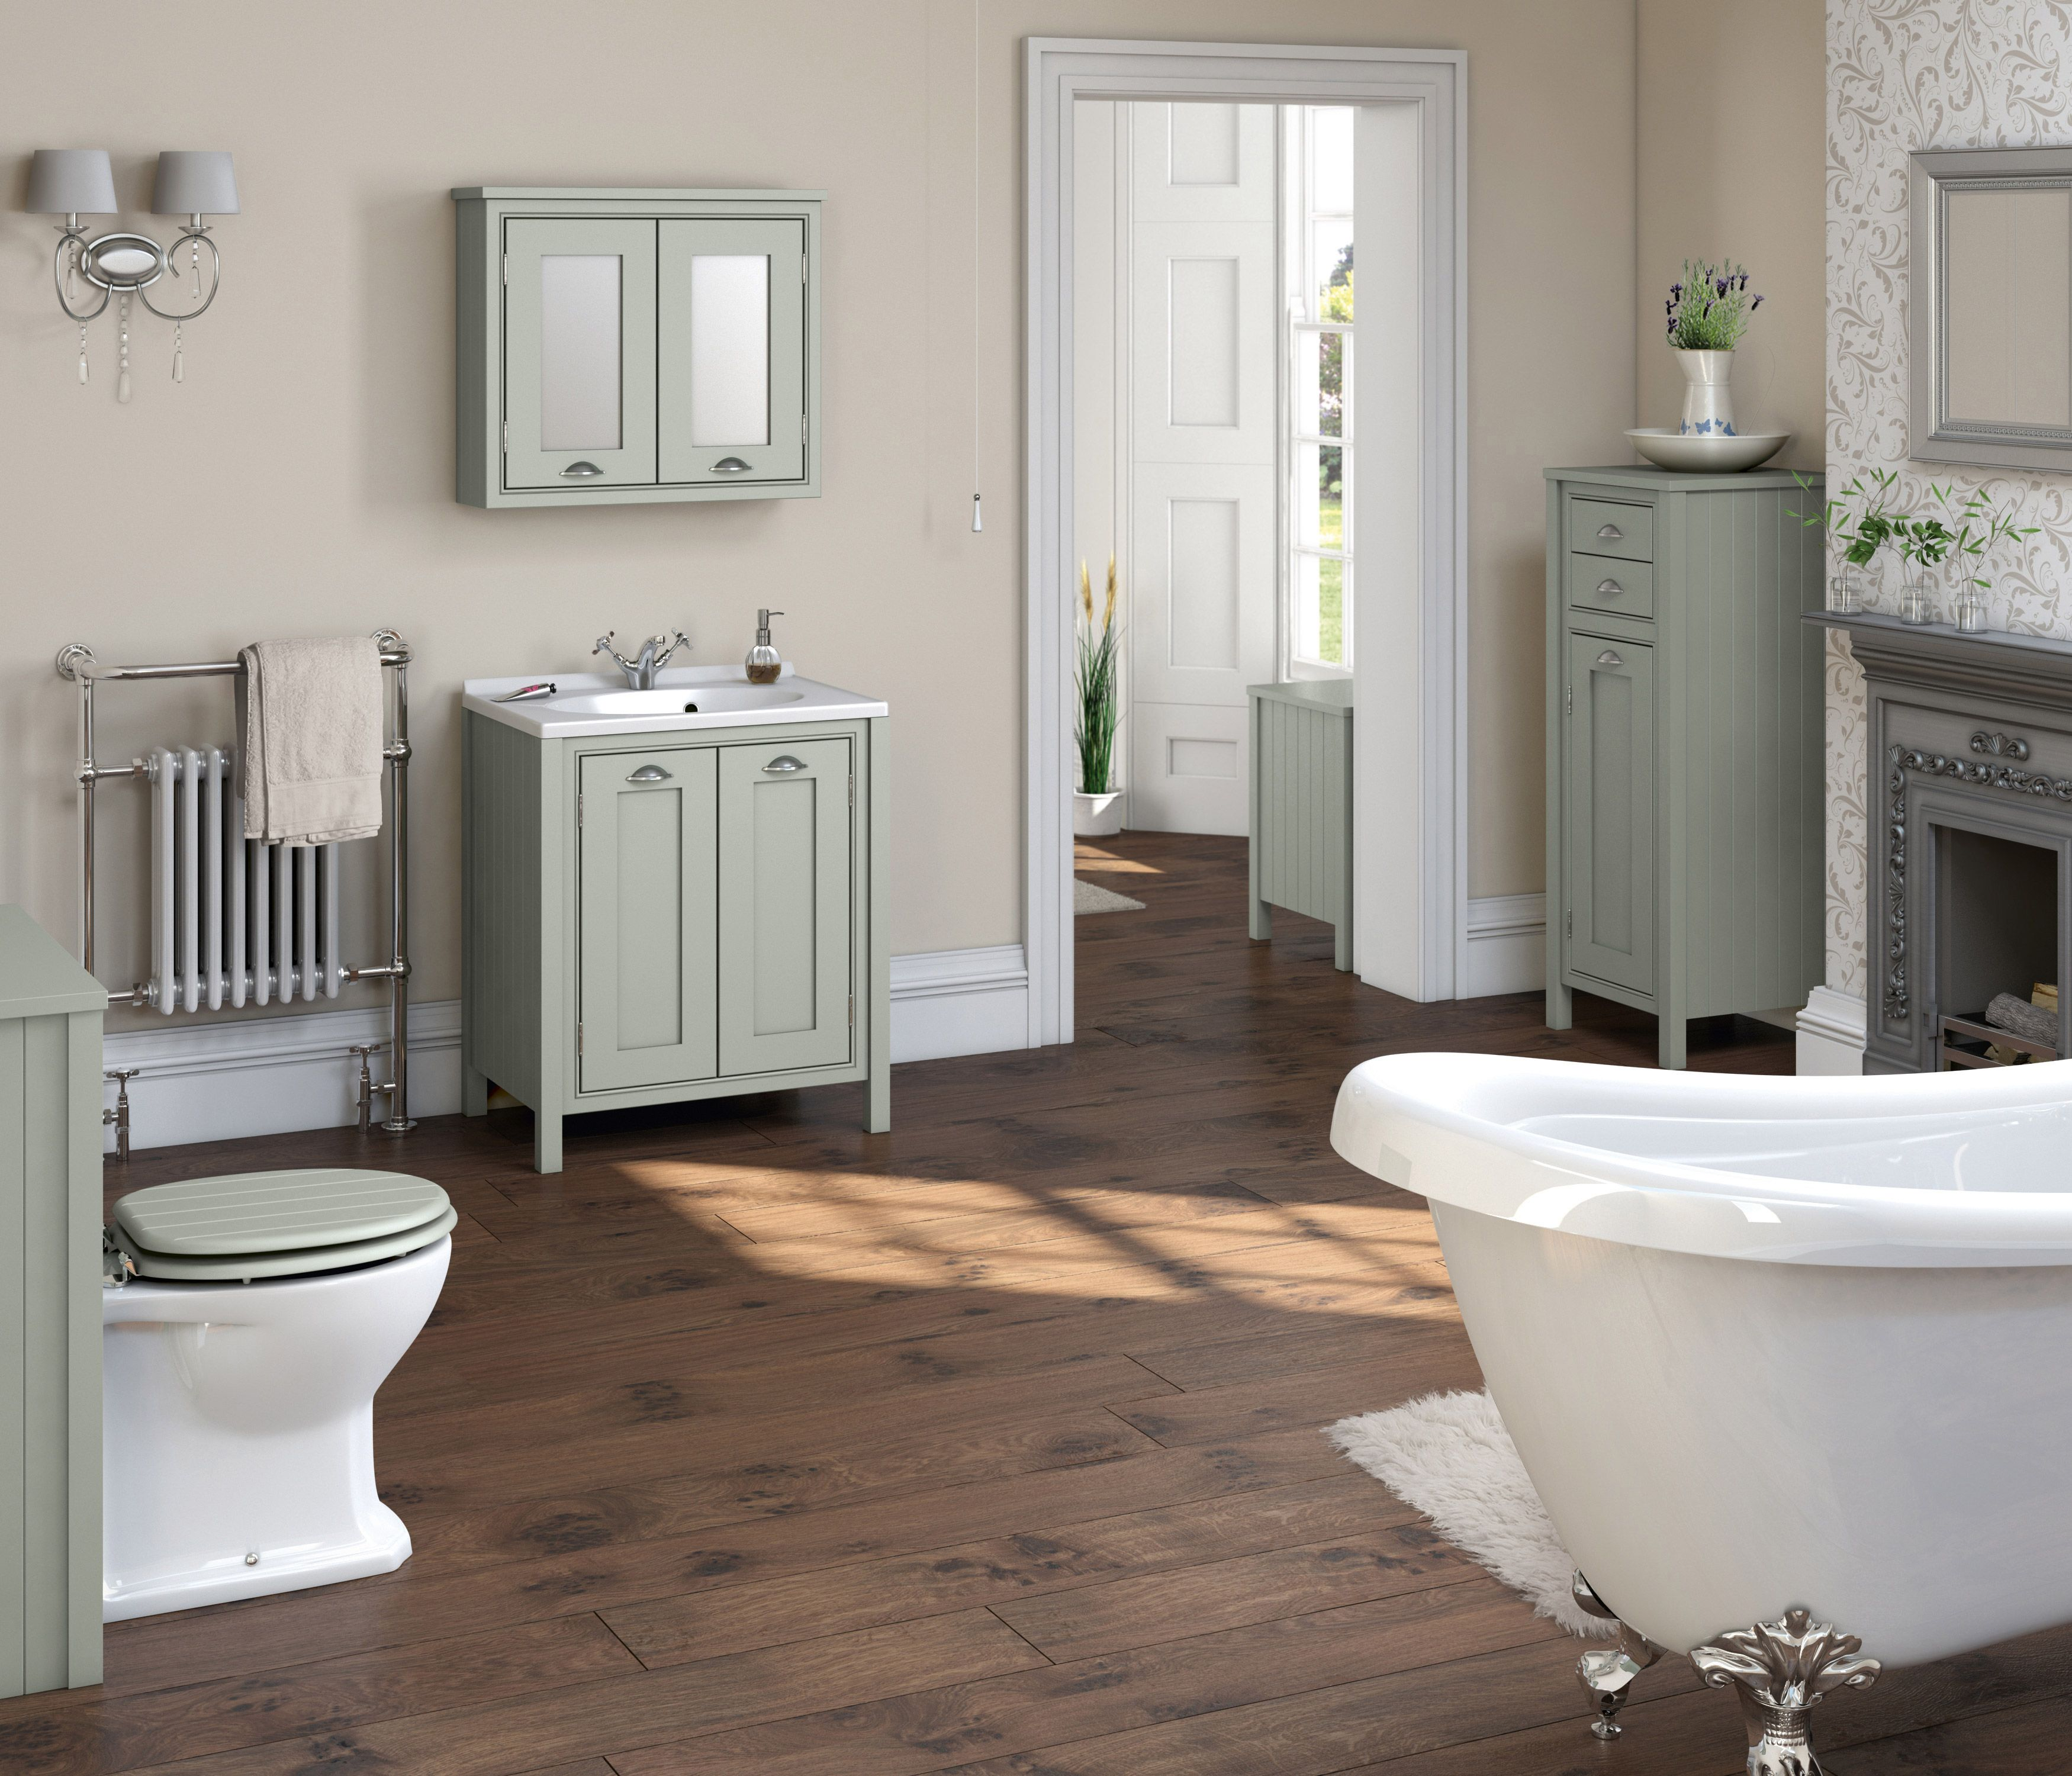 31 Beautiful Traditional Bathroom Design  Traditional Bathroom Alluring Traditional Bathroom Design Ideas Inspiration